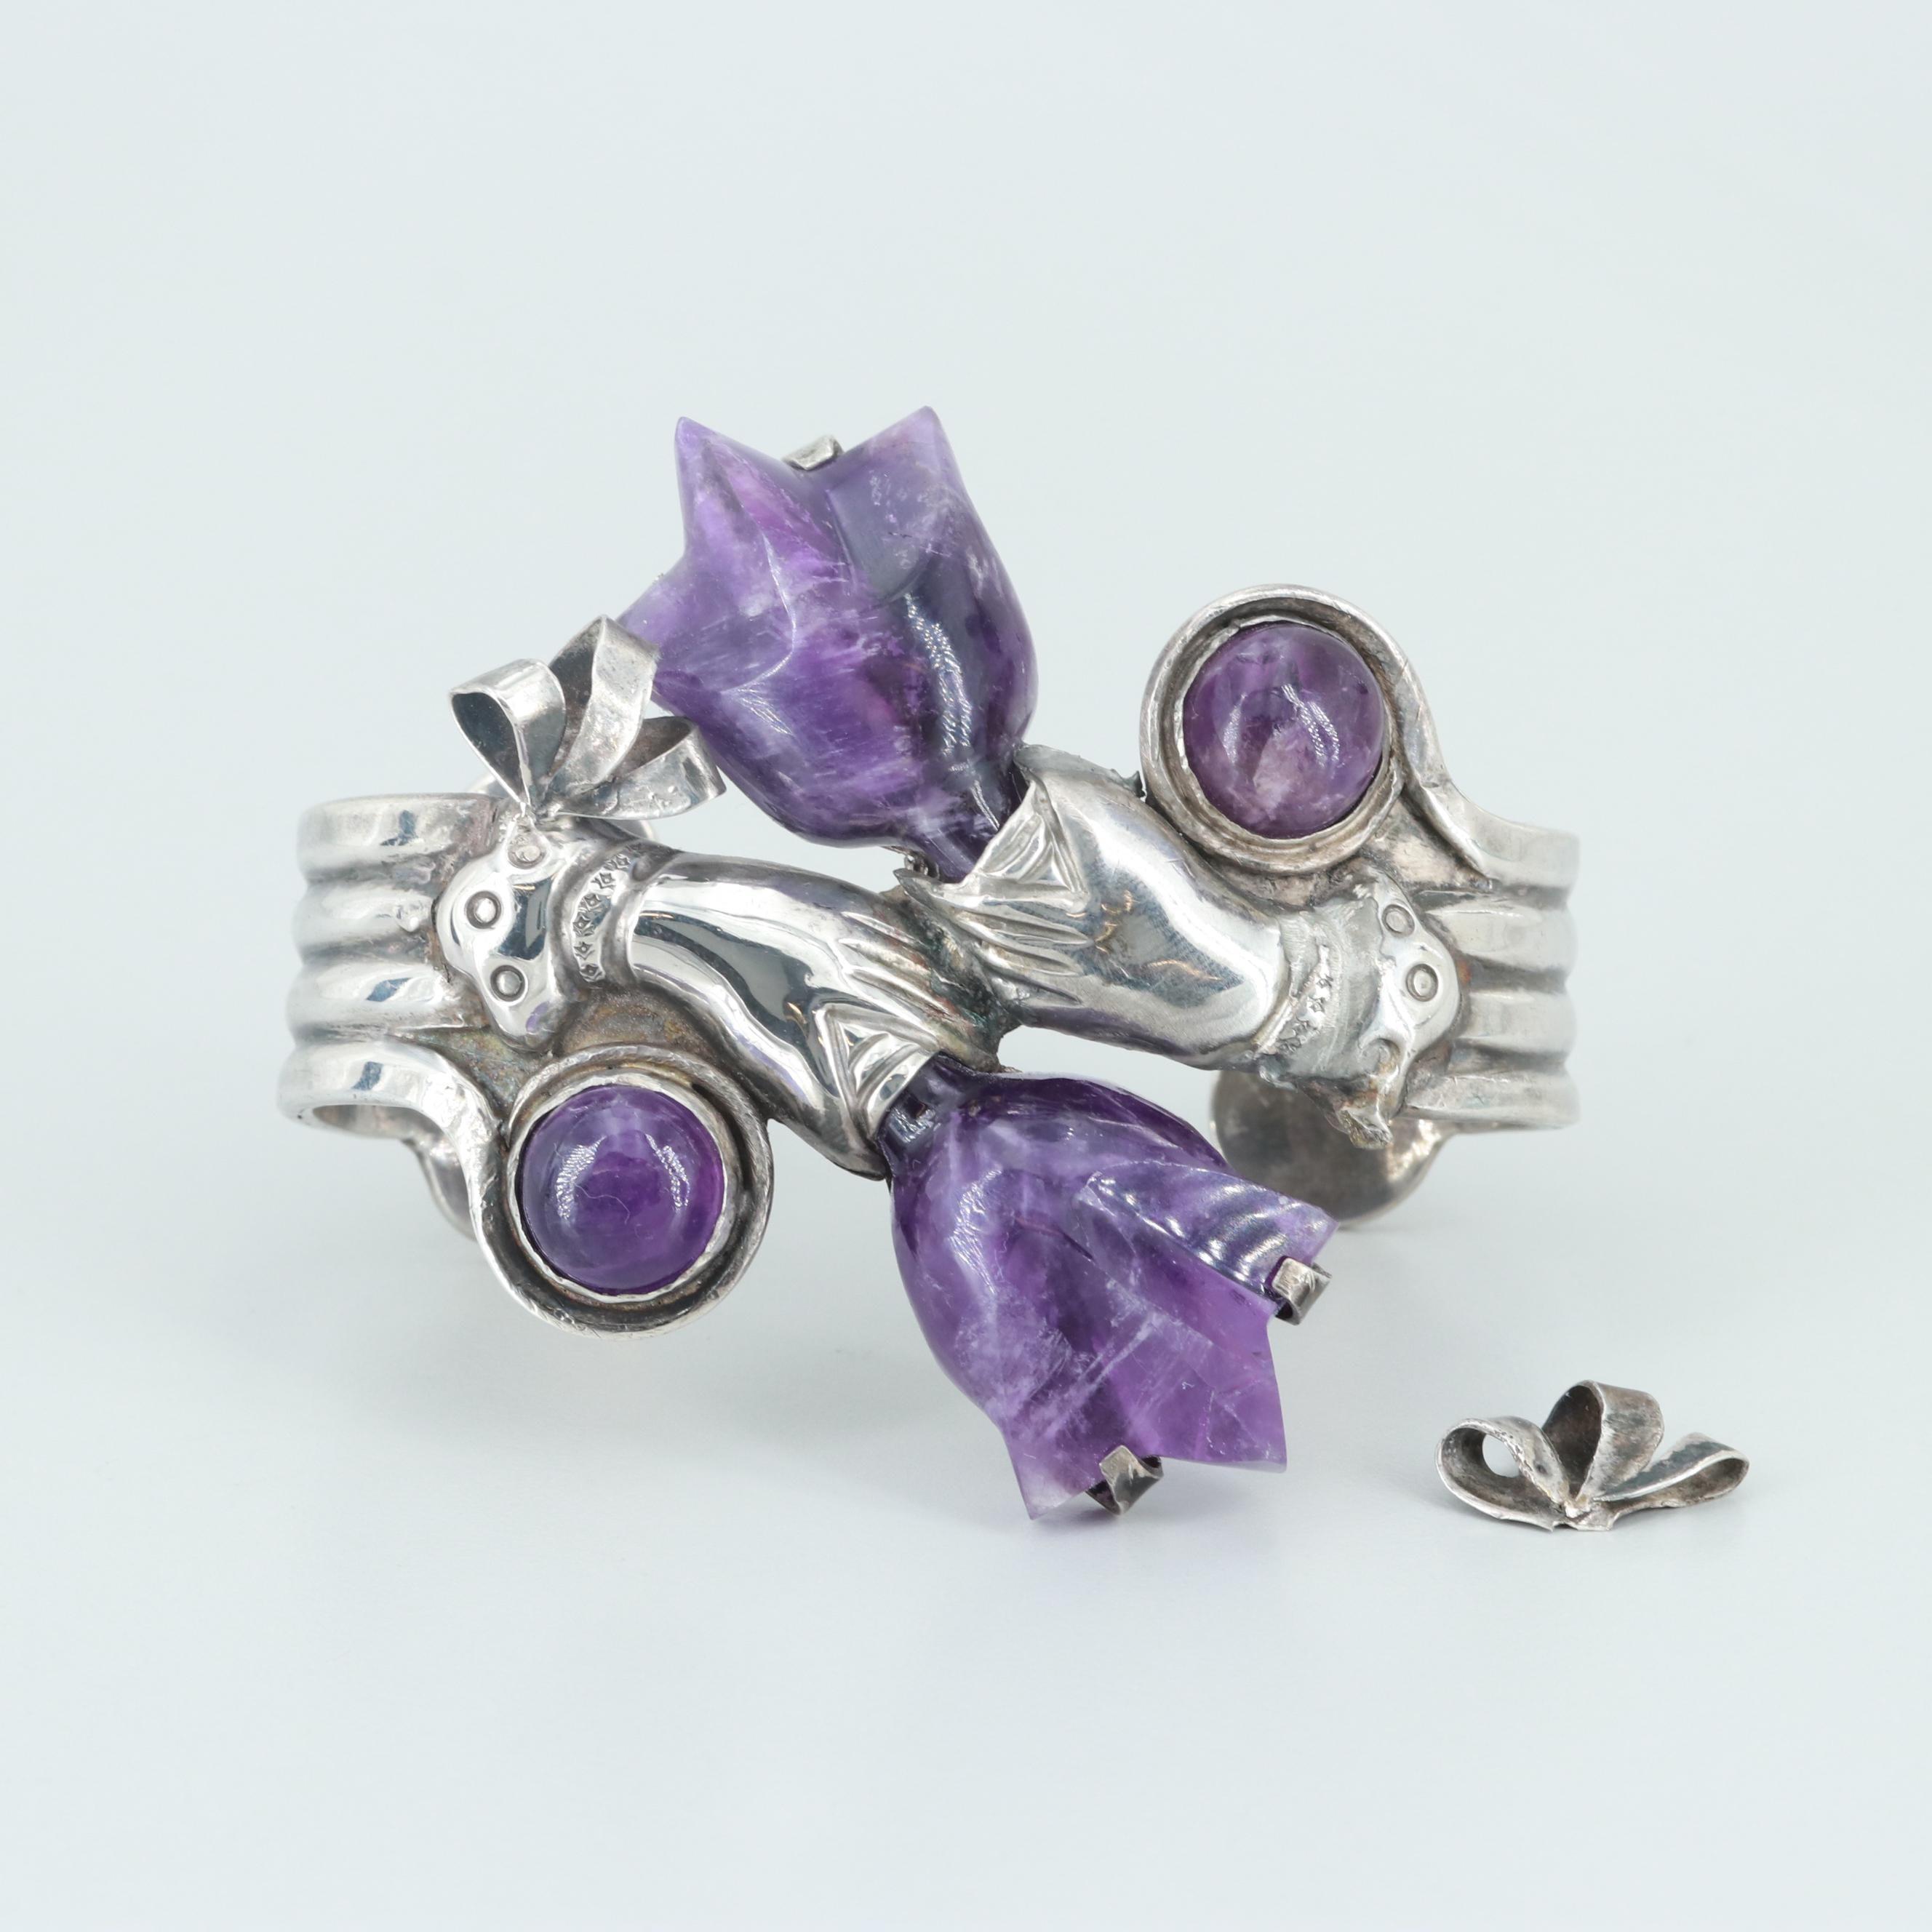 Circa 1940s Mexican Sterling Silver Amethyst Cuff Bracelet